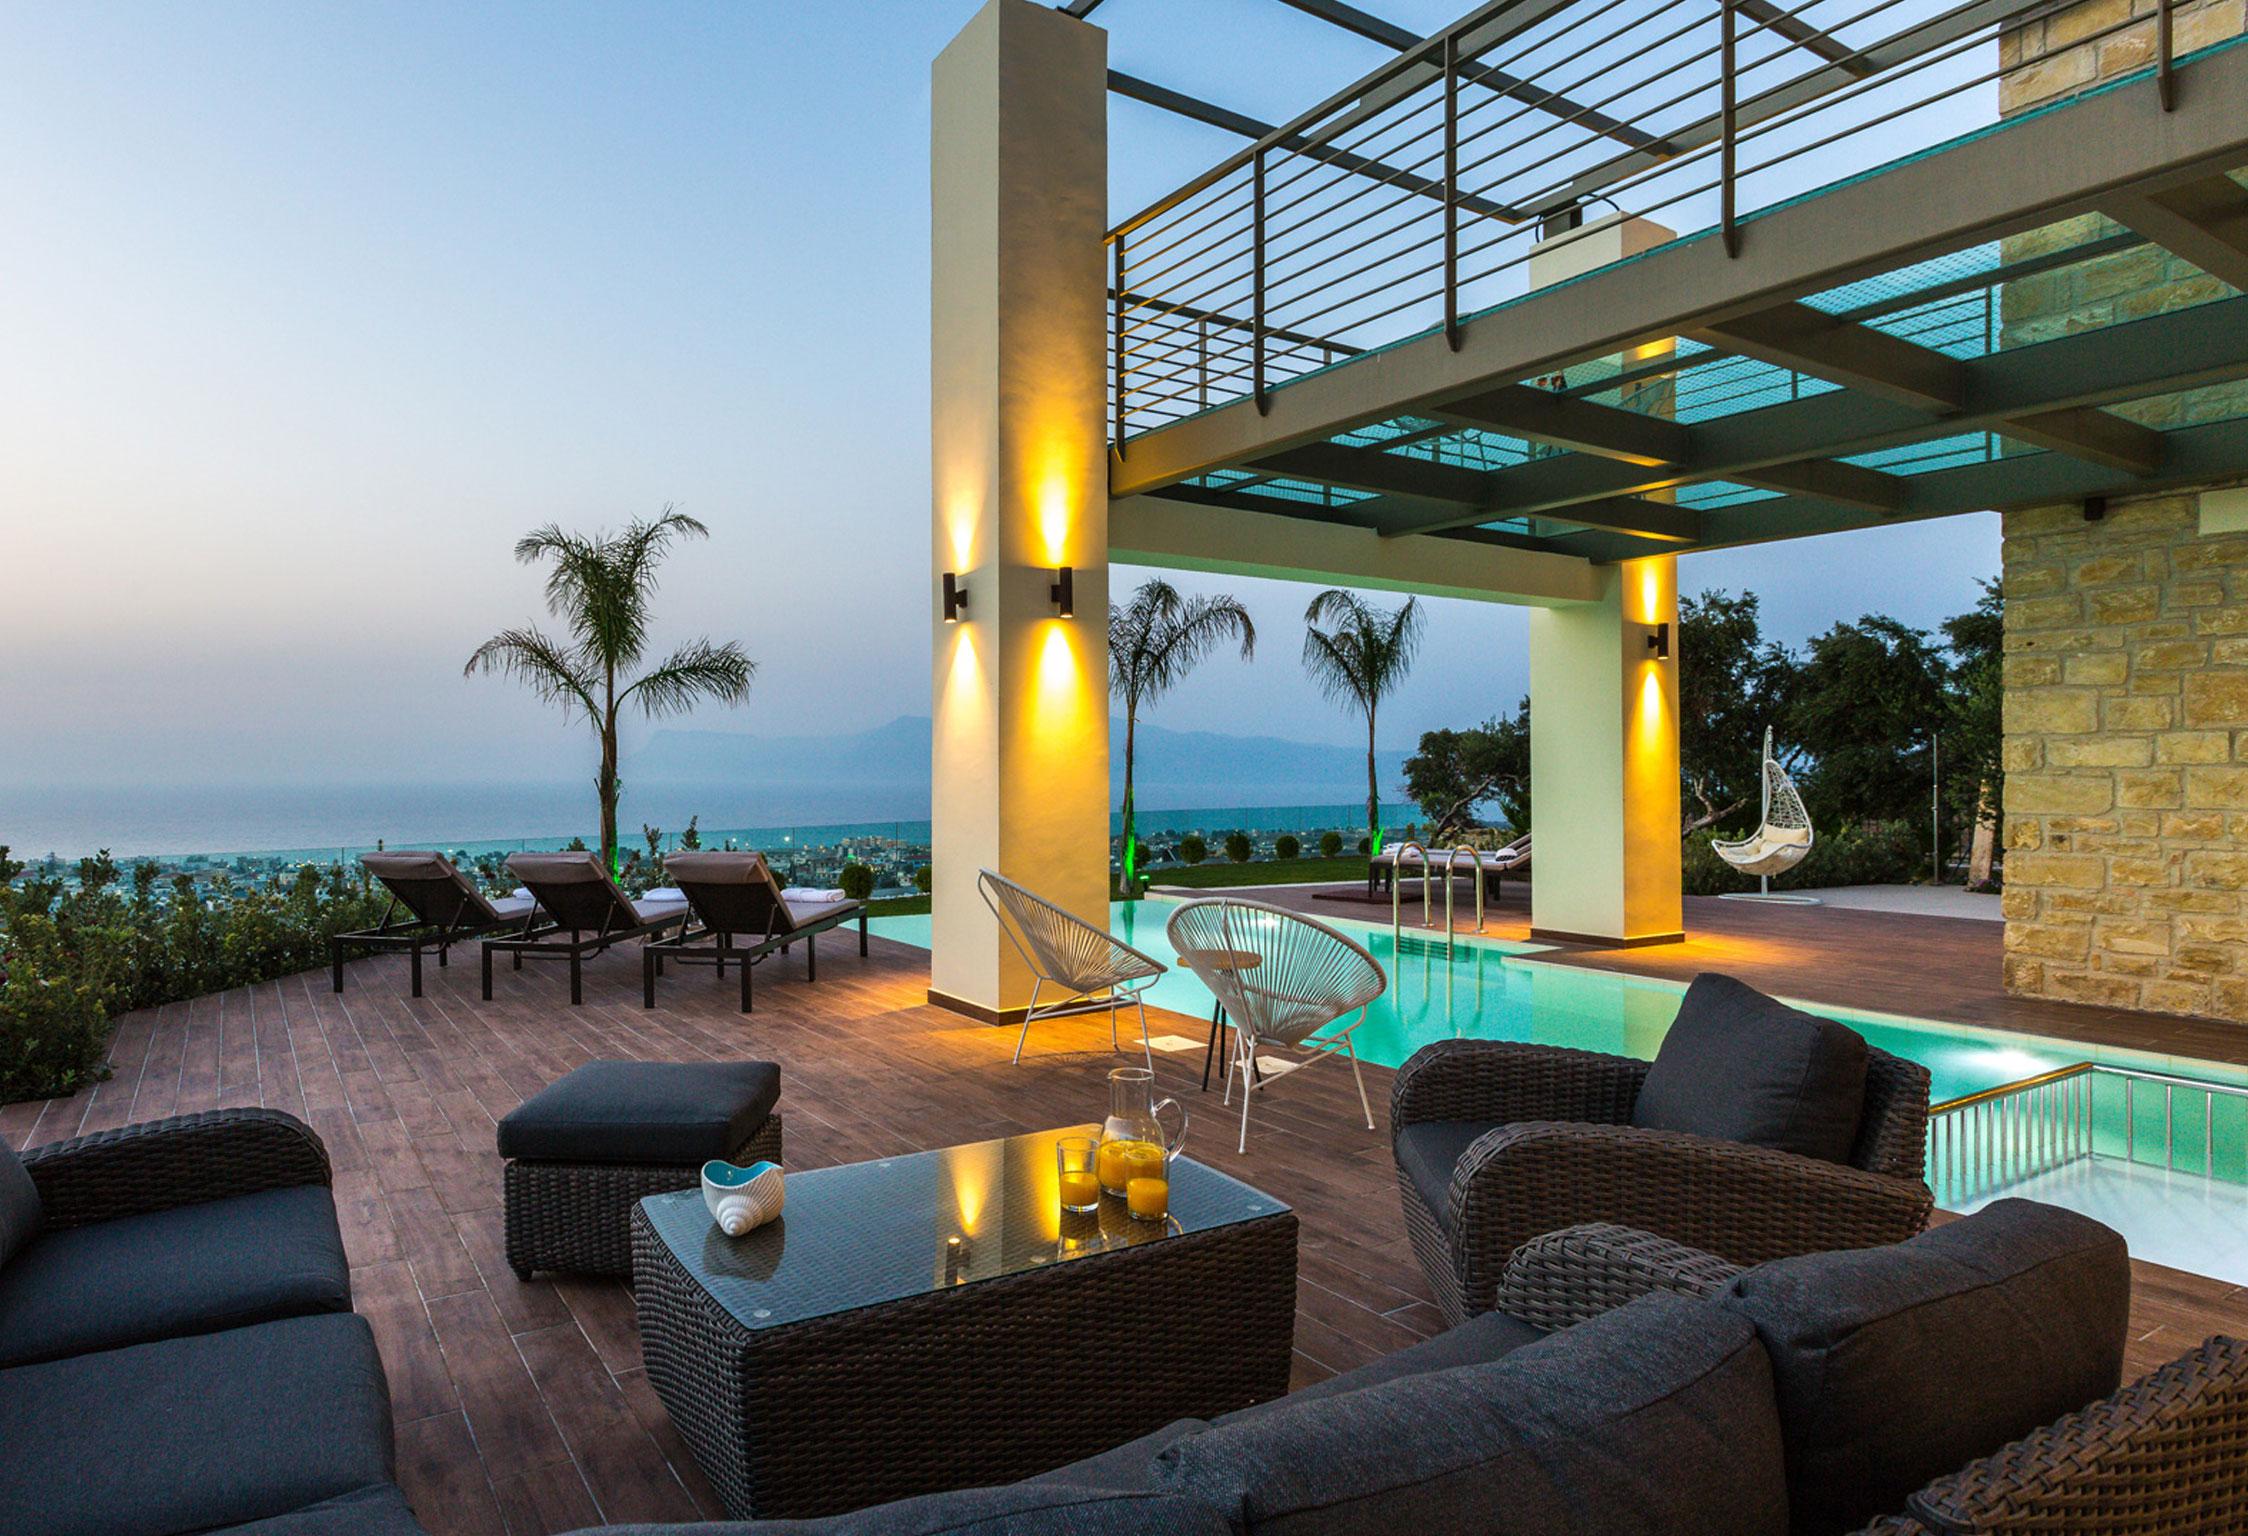 Crete Villa Bretta jumbotron image